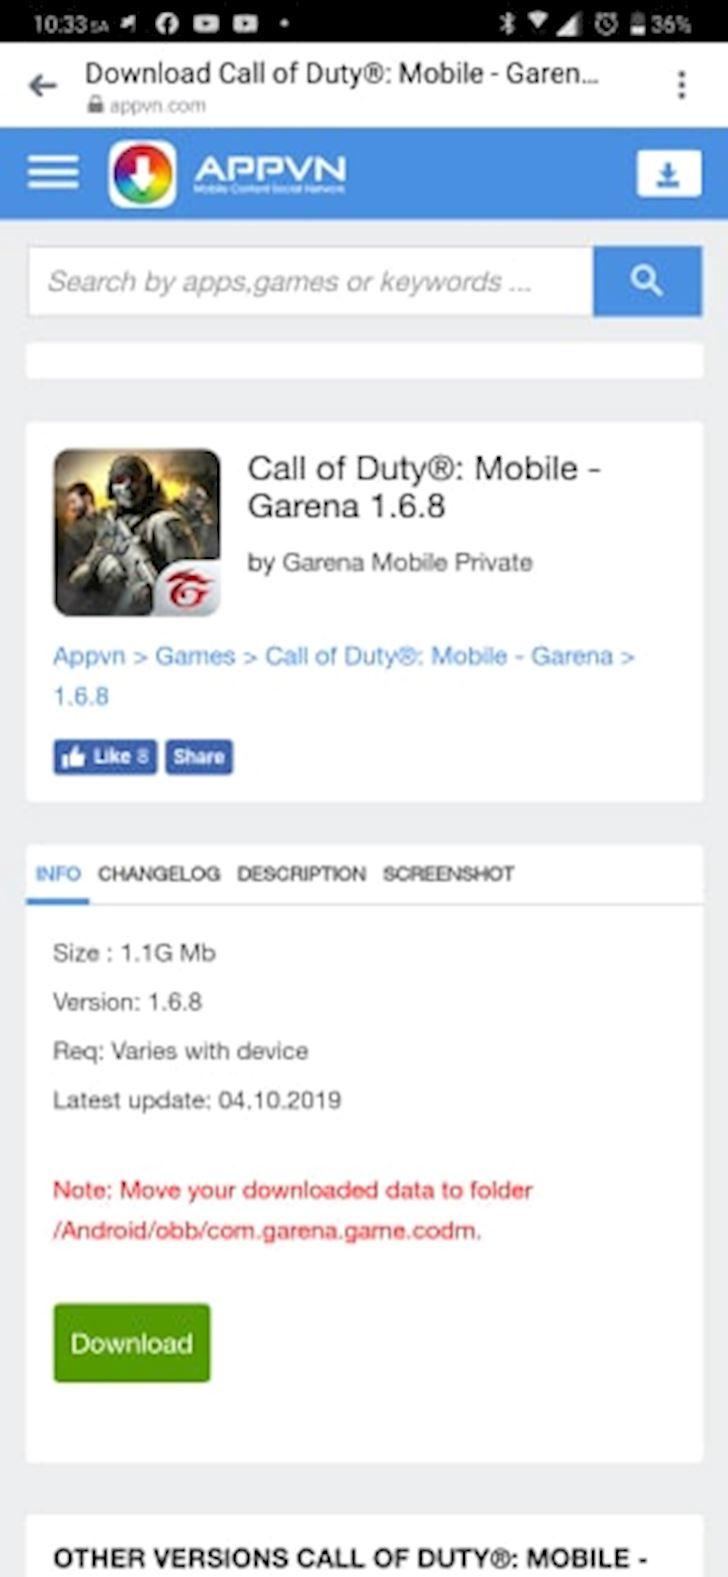 Huong dan tai game va gia lap Call of Duty Mobile